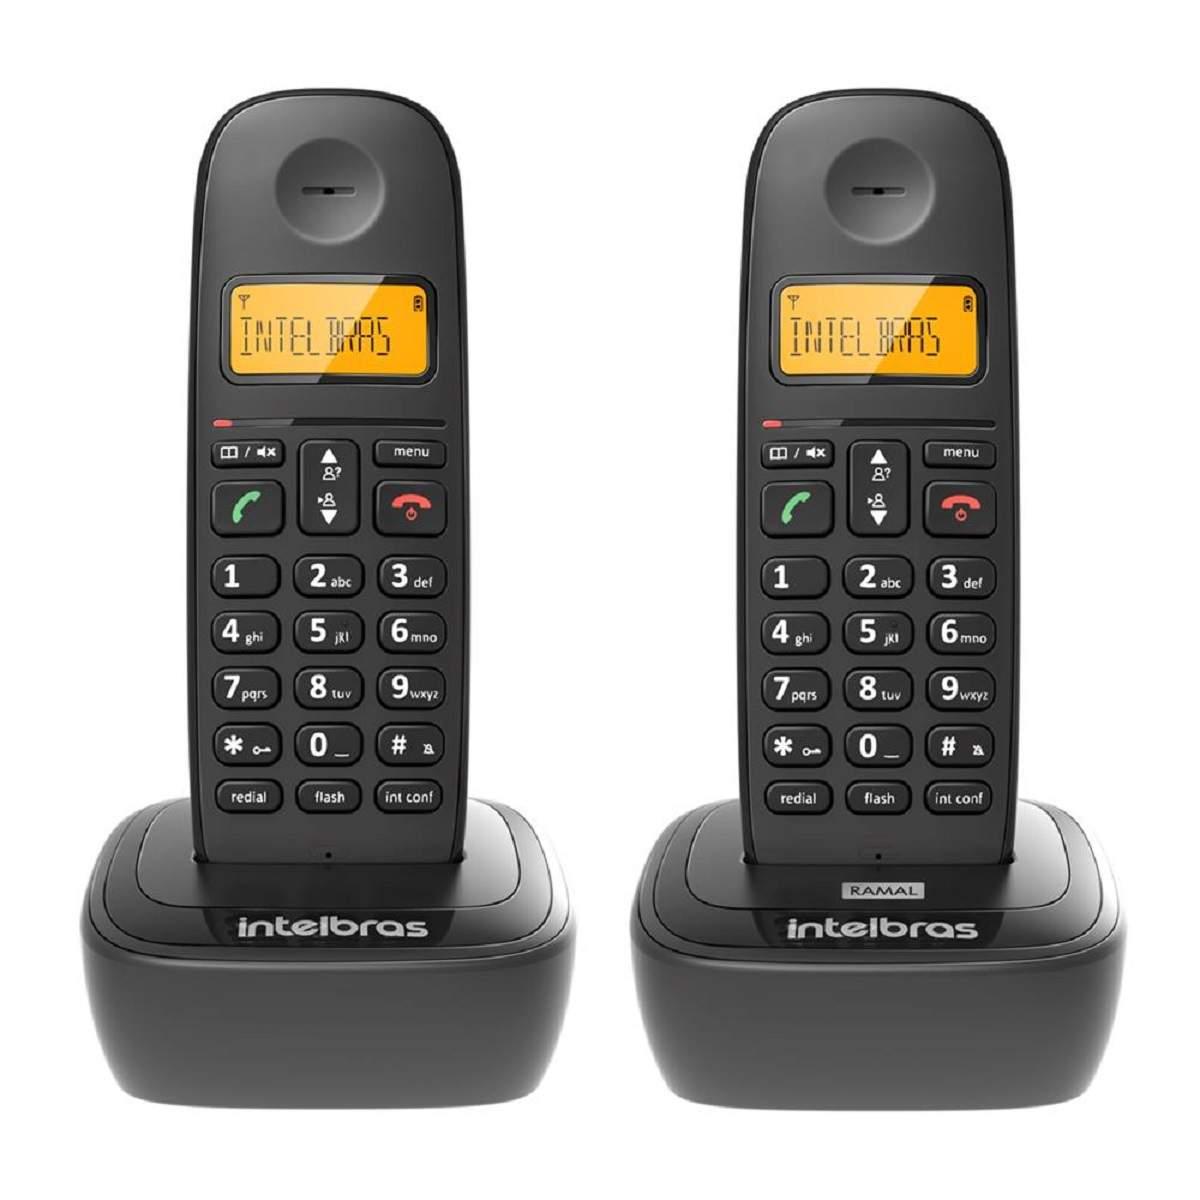 Telefone Sem Fio Com 1 Ramal Intelbras TS 2512 - Id Chamada Preto Bivolt